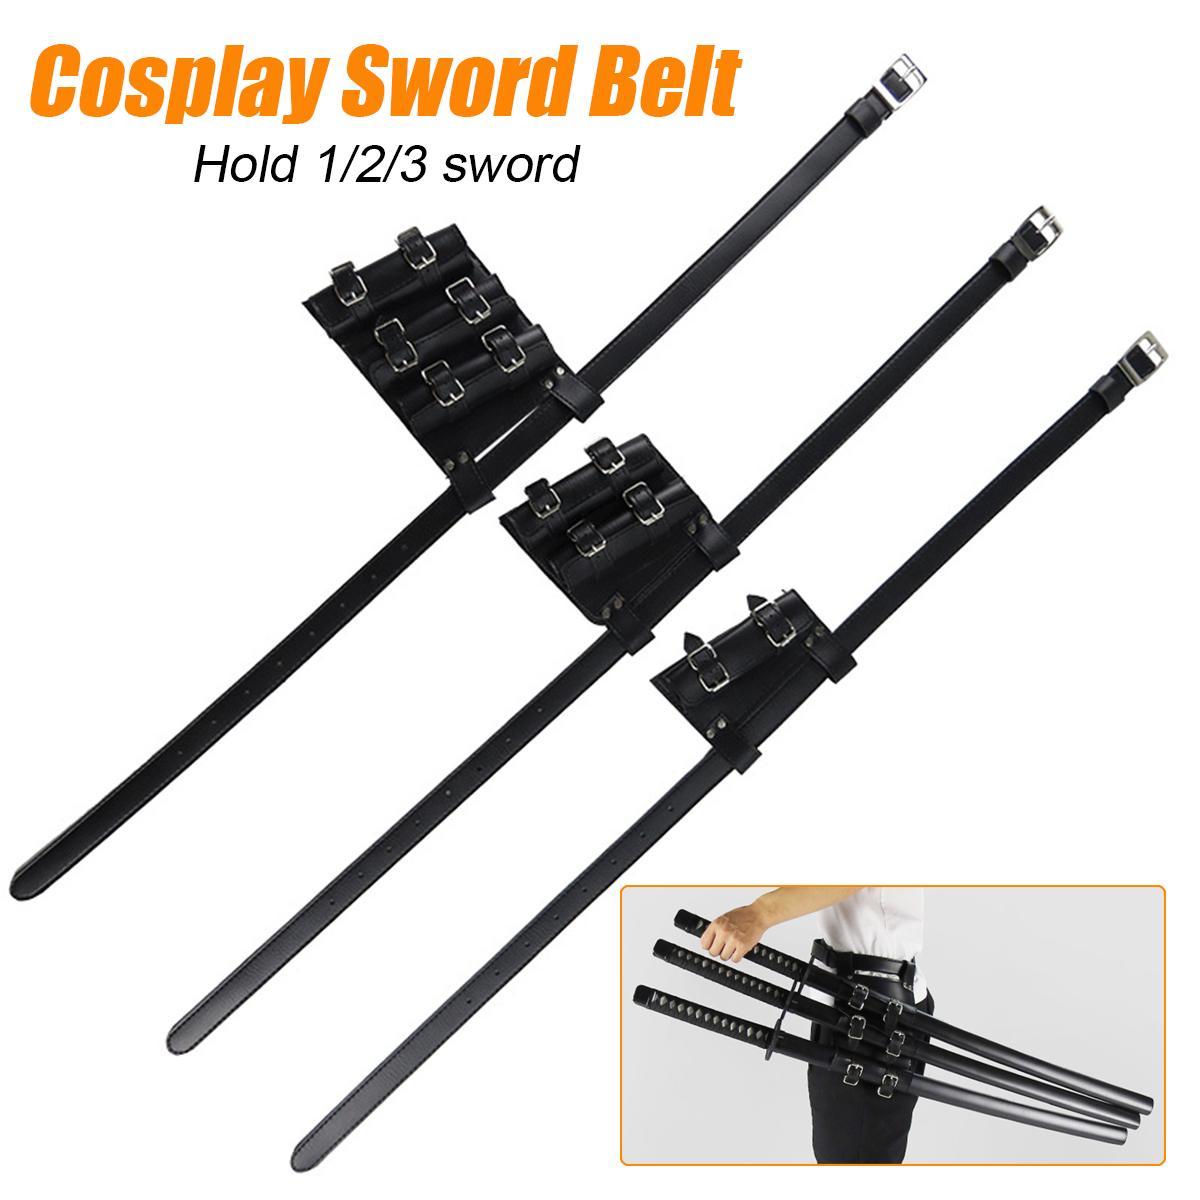 1/2/3 Sword  Sword Holder PU Belt Waist Sheath Adult Men Larp Warrior Cosplay Leather Buckle Strap For Comic Show